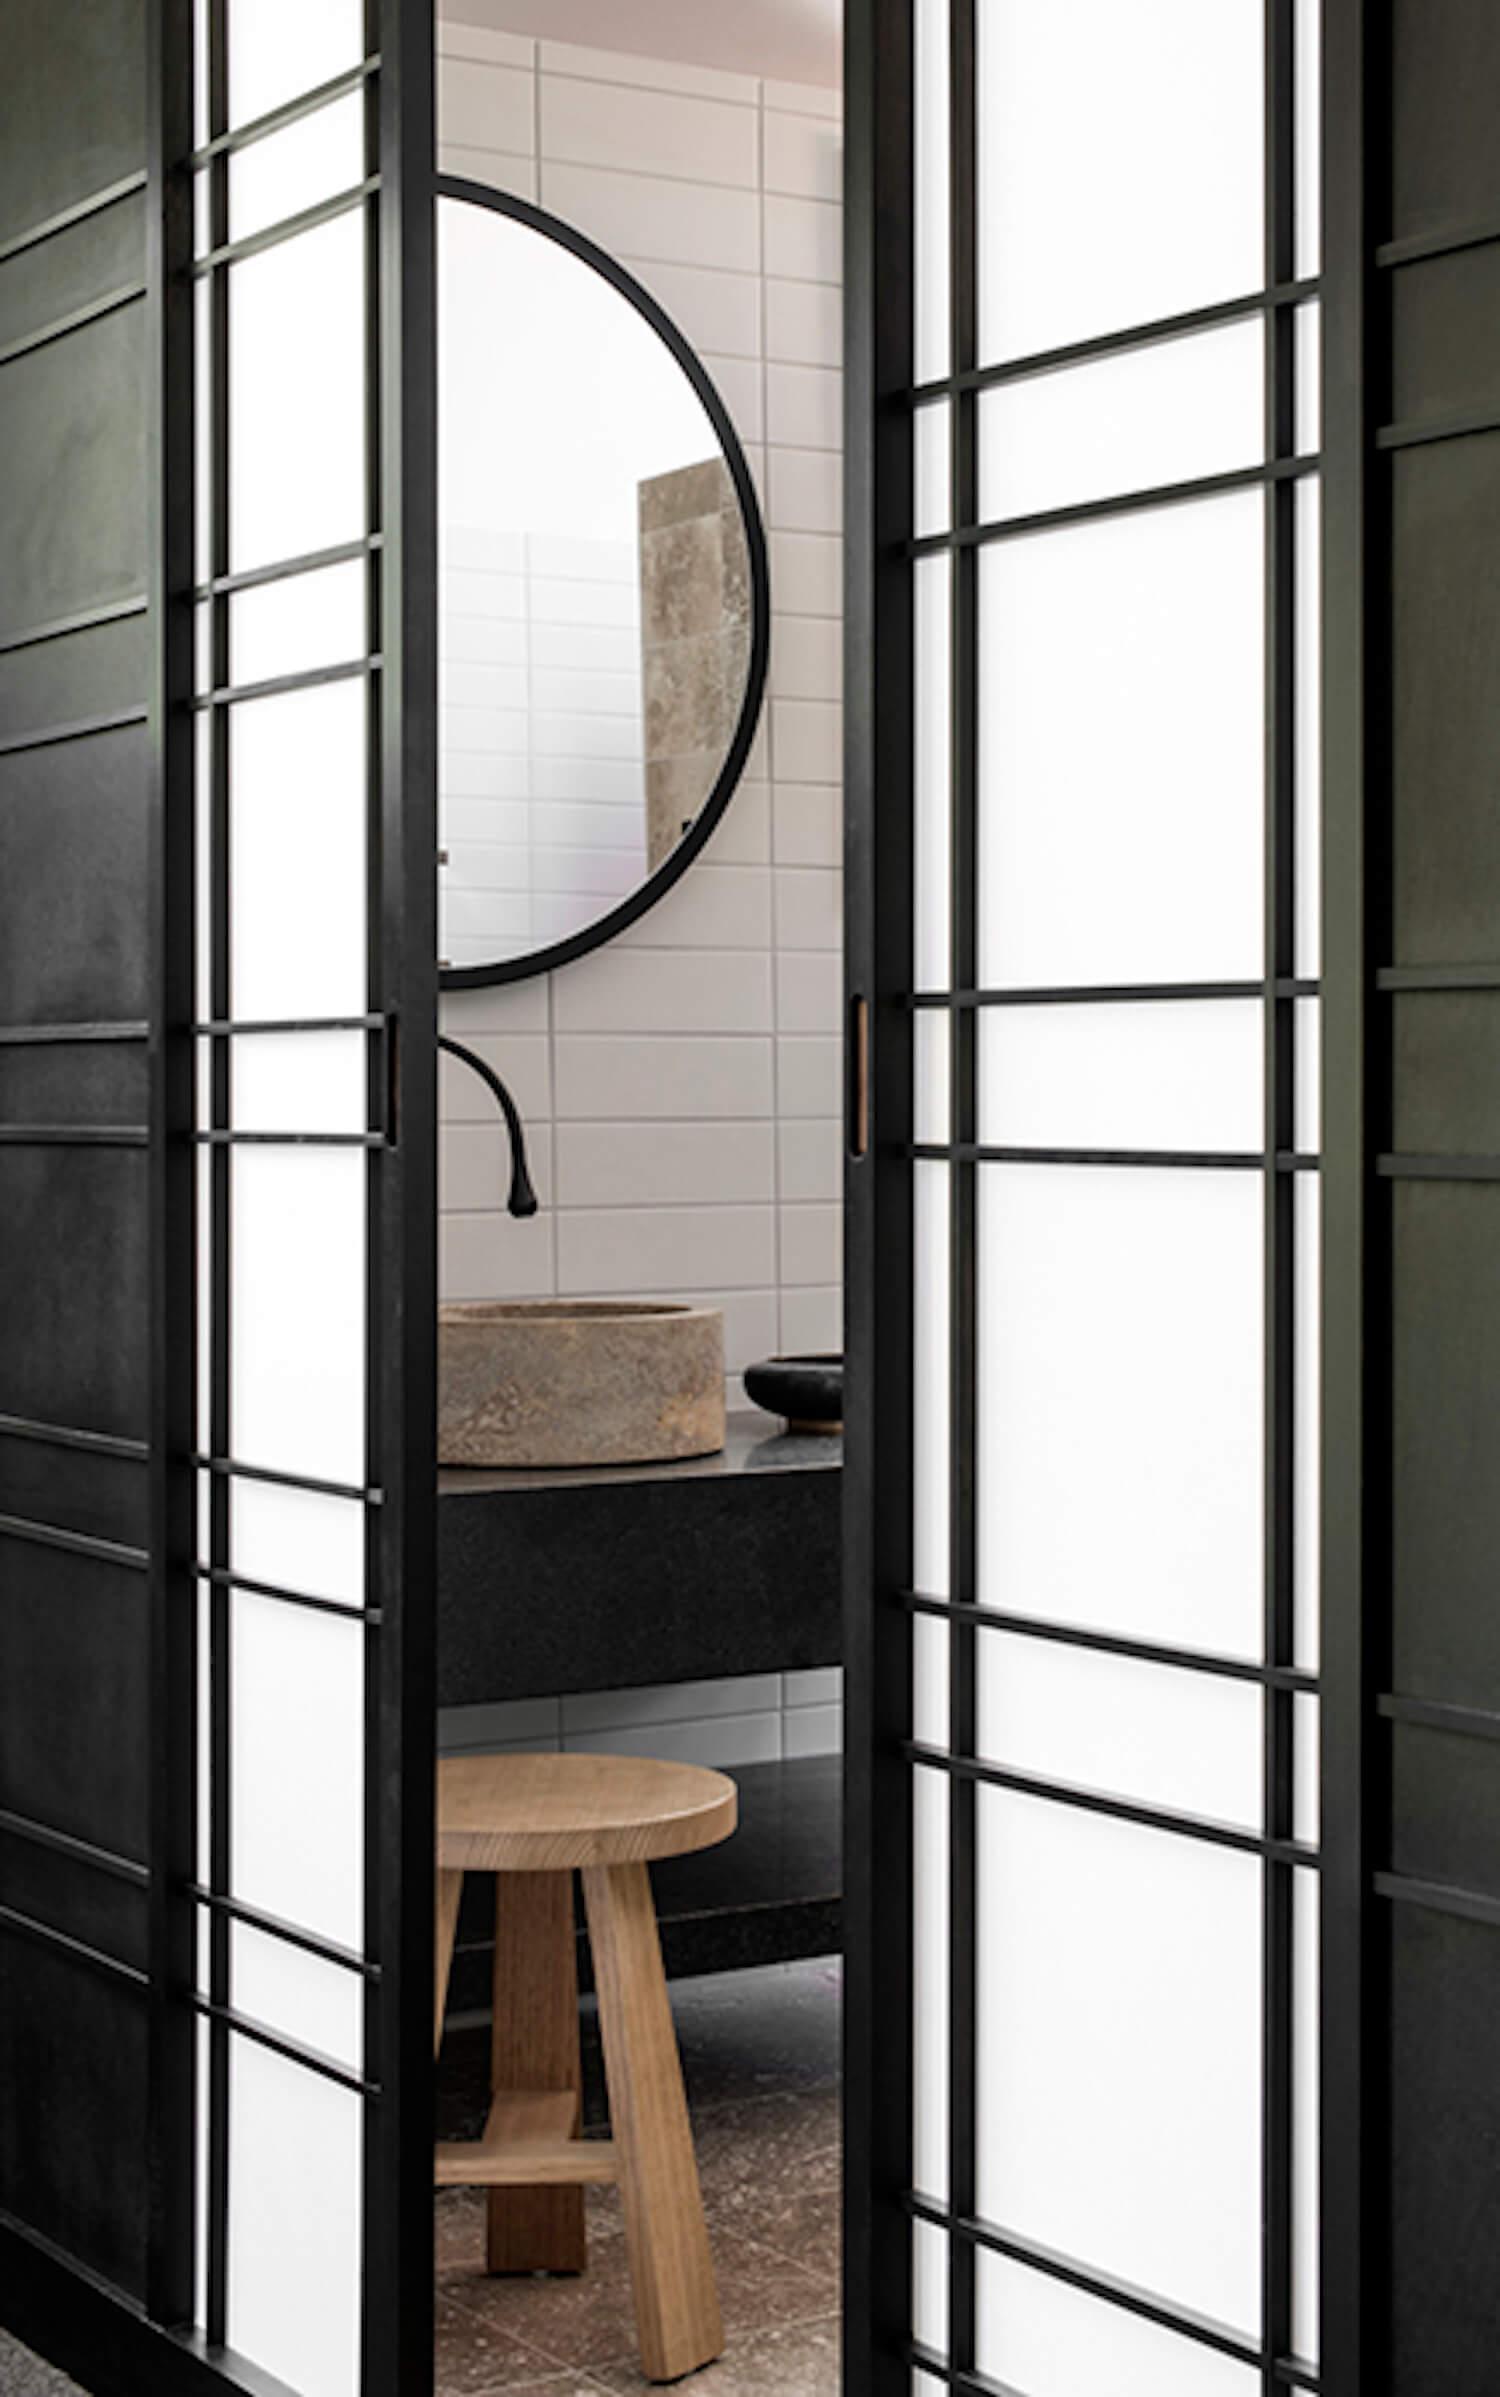 est living gessi european design global living dcruz interiordesignideas residential beecrofthousesydney1